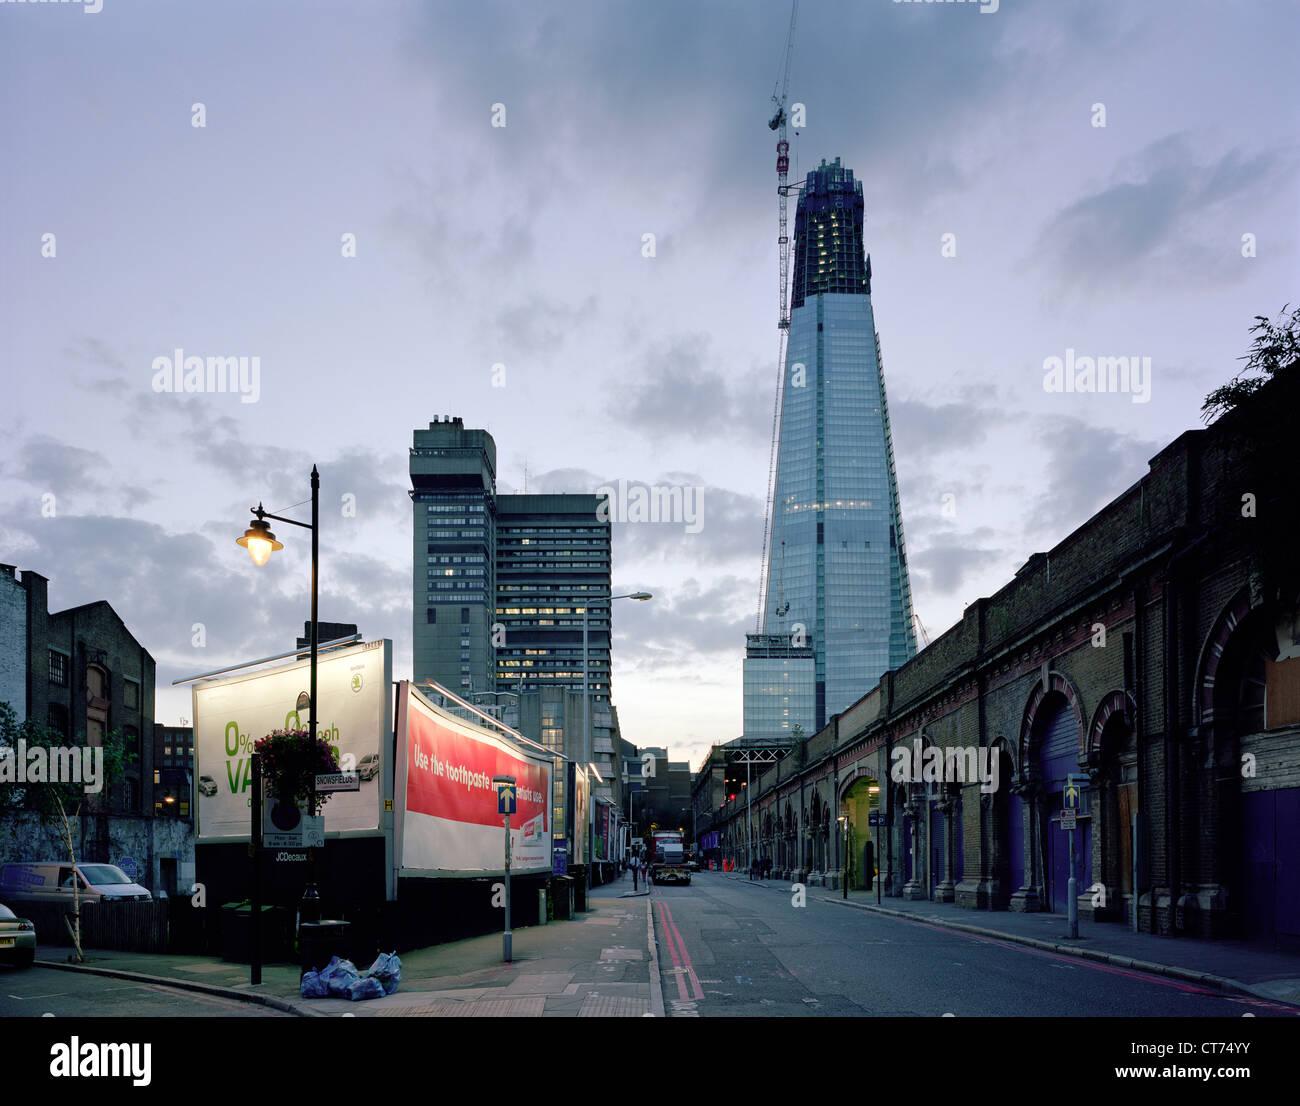 Shard, London, United Kingdom. Architect: Renzo Piano Building Workshop, 2012. Dusk view from St Thomas Street (east). Stock Photo